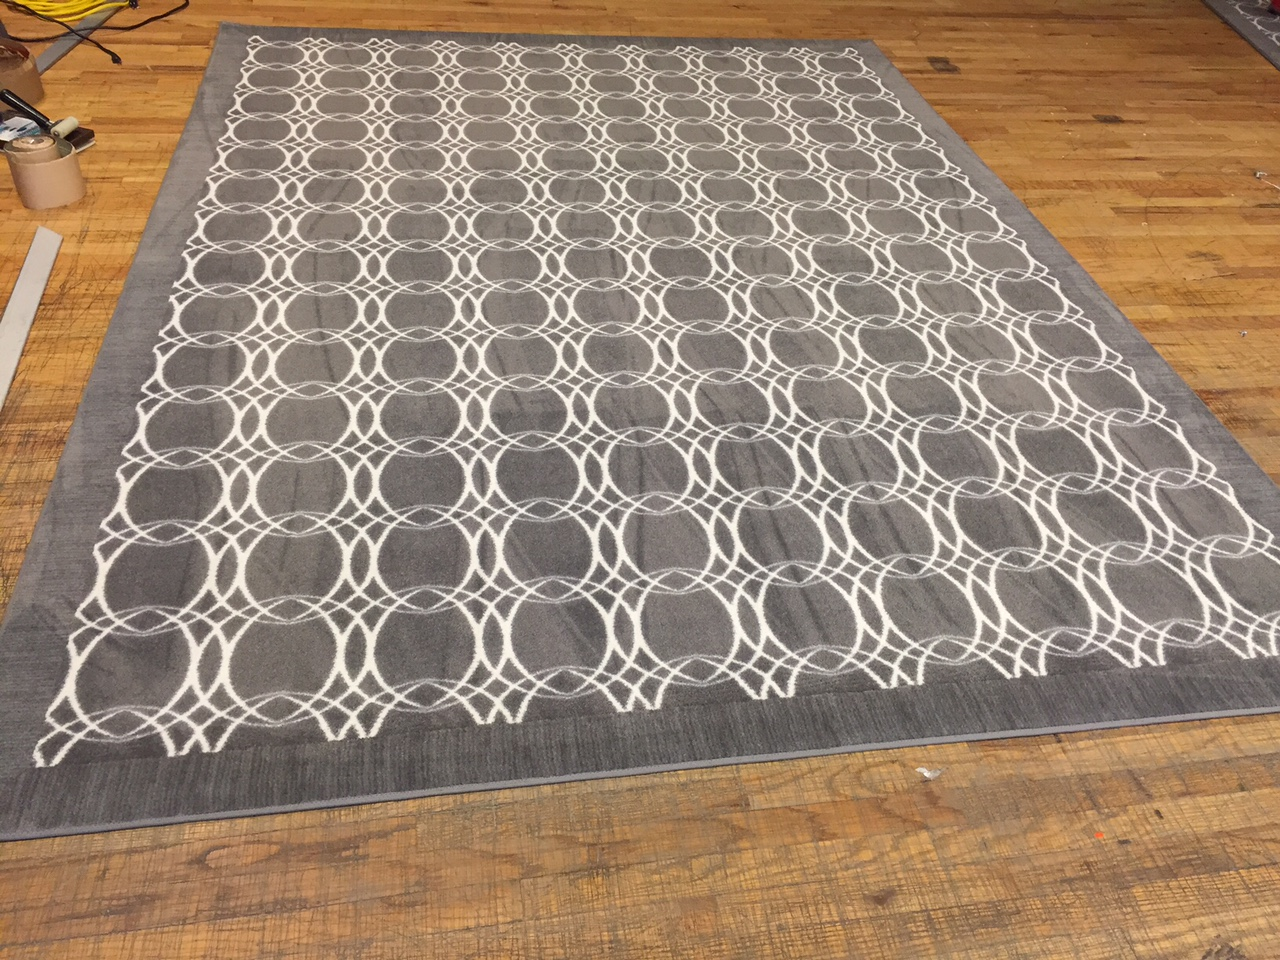 Yonan Carpet One  Chicagos Flooring Specialists  Custom